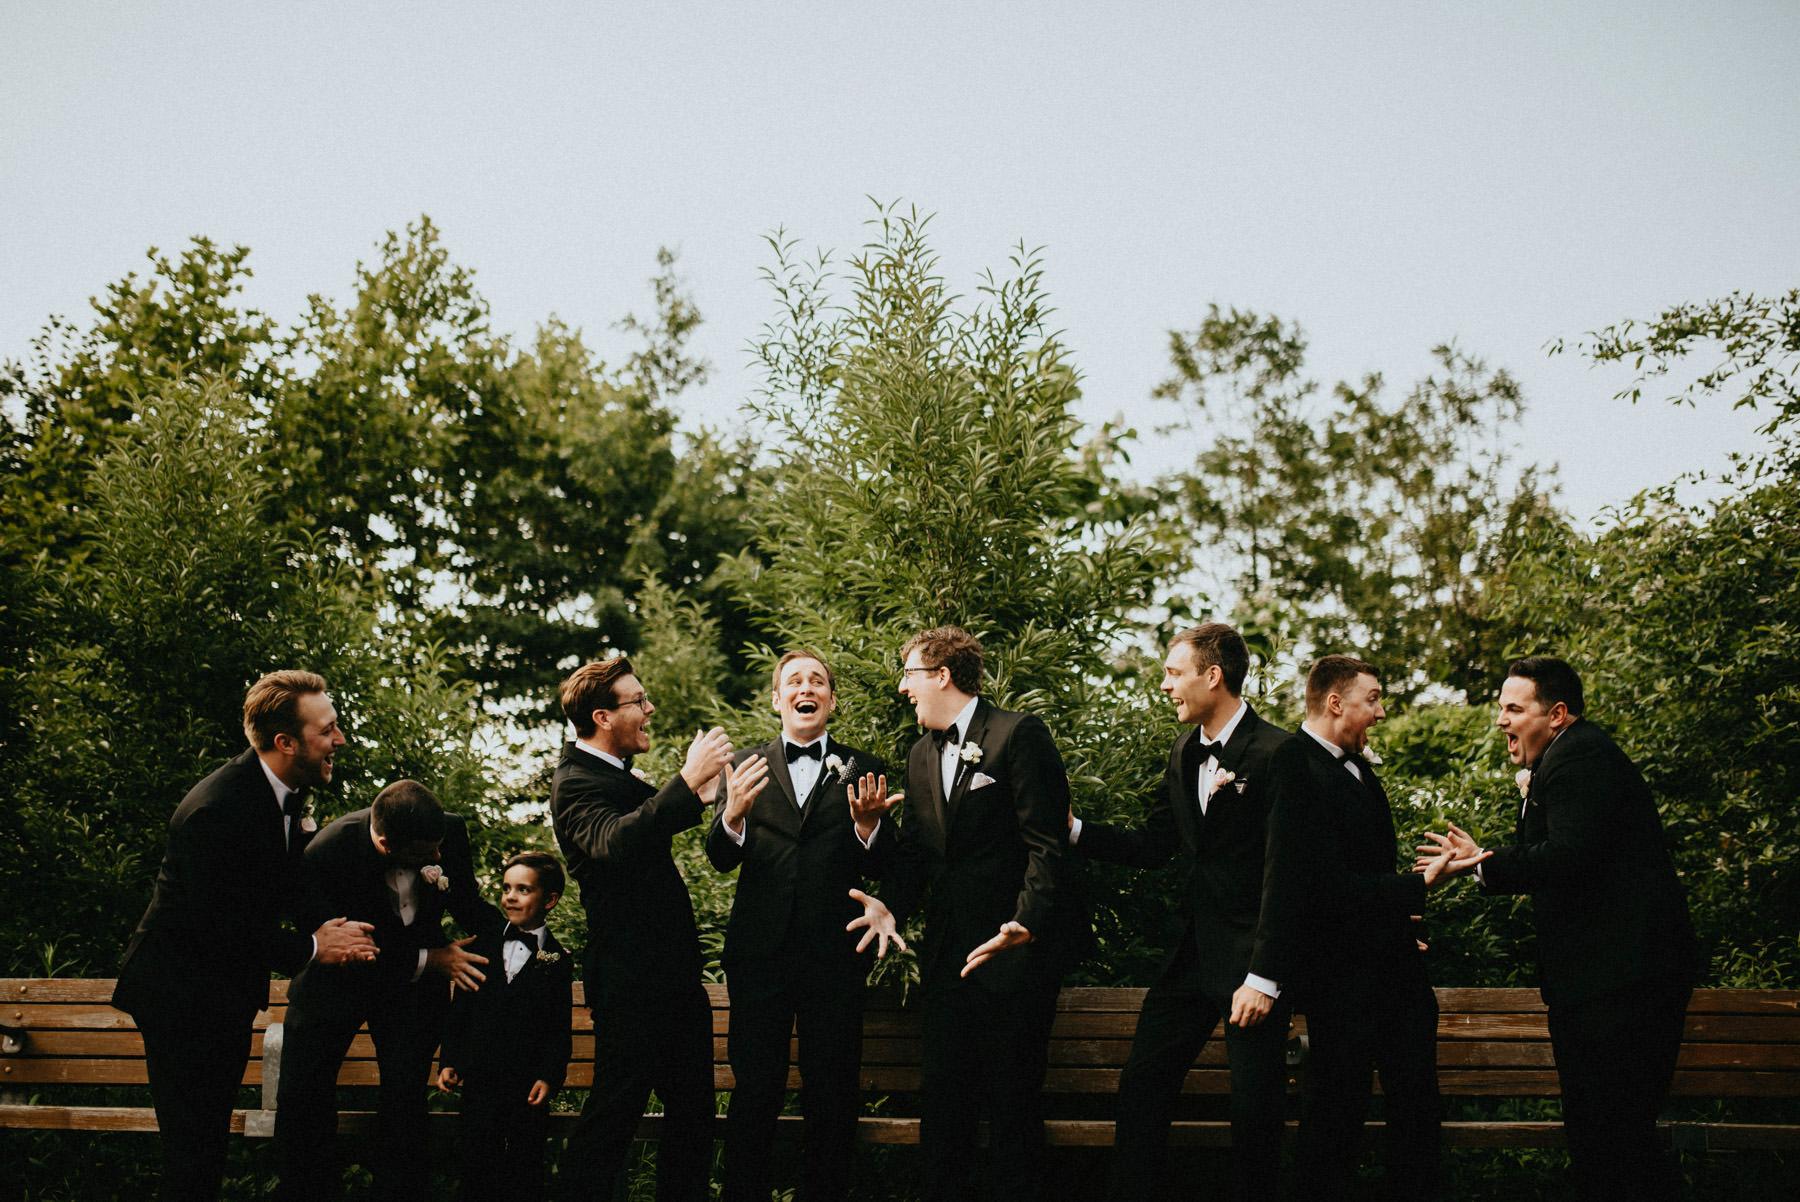 249-liberty-warehouse-brooklyn-wedding-6.jpg